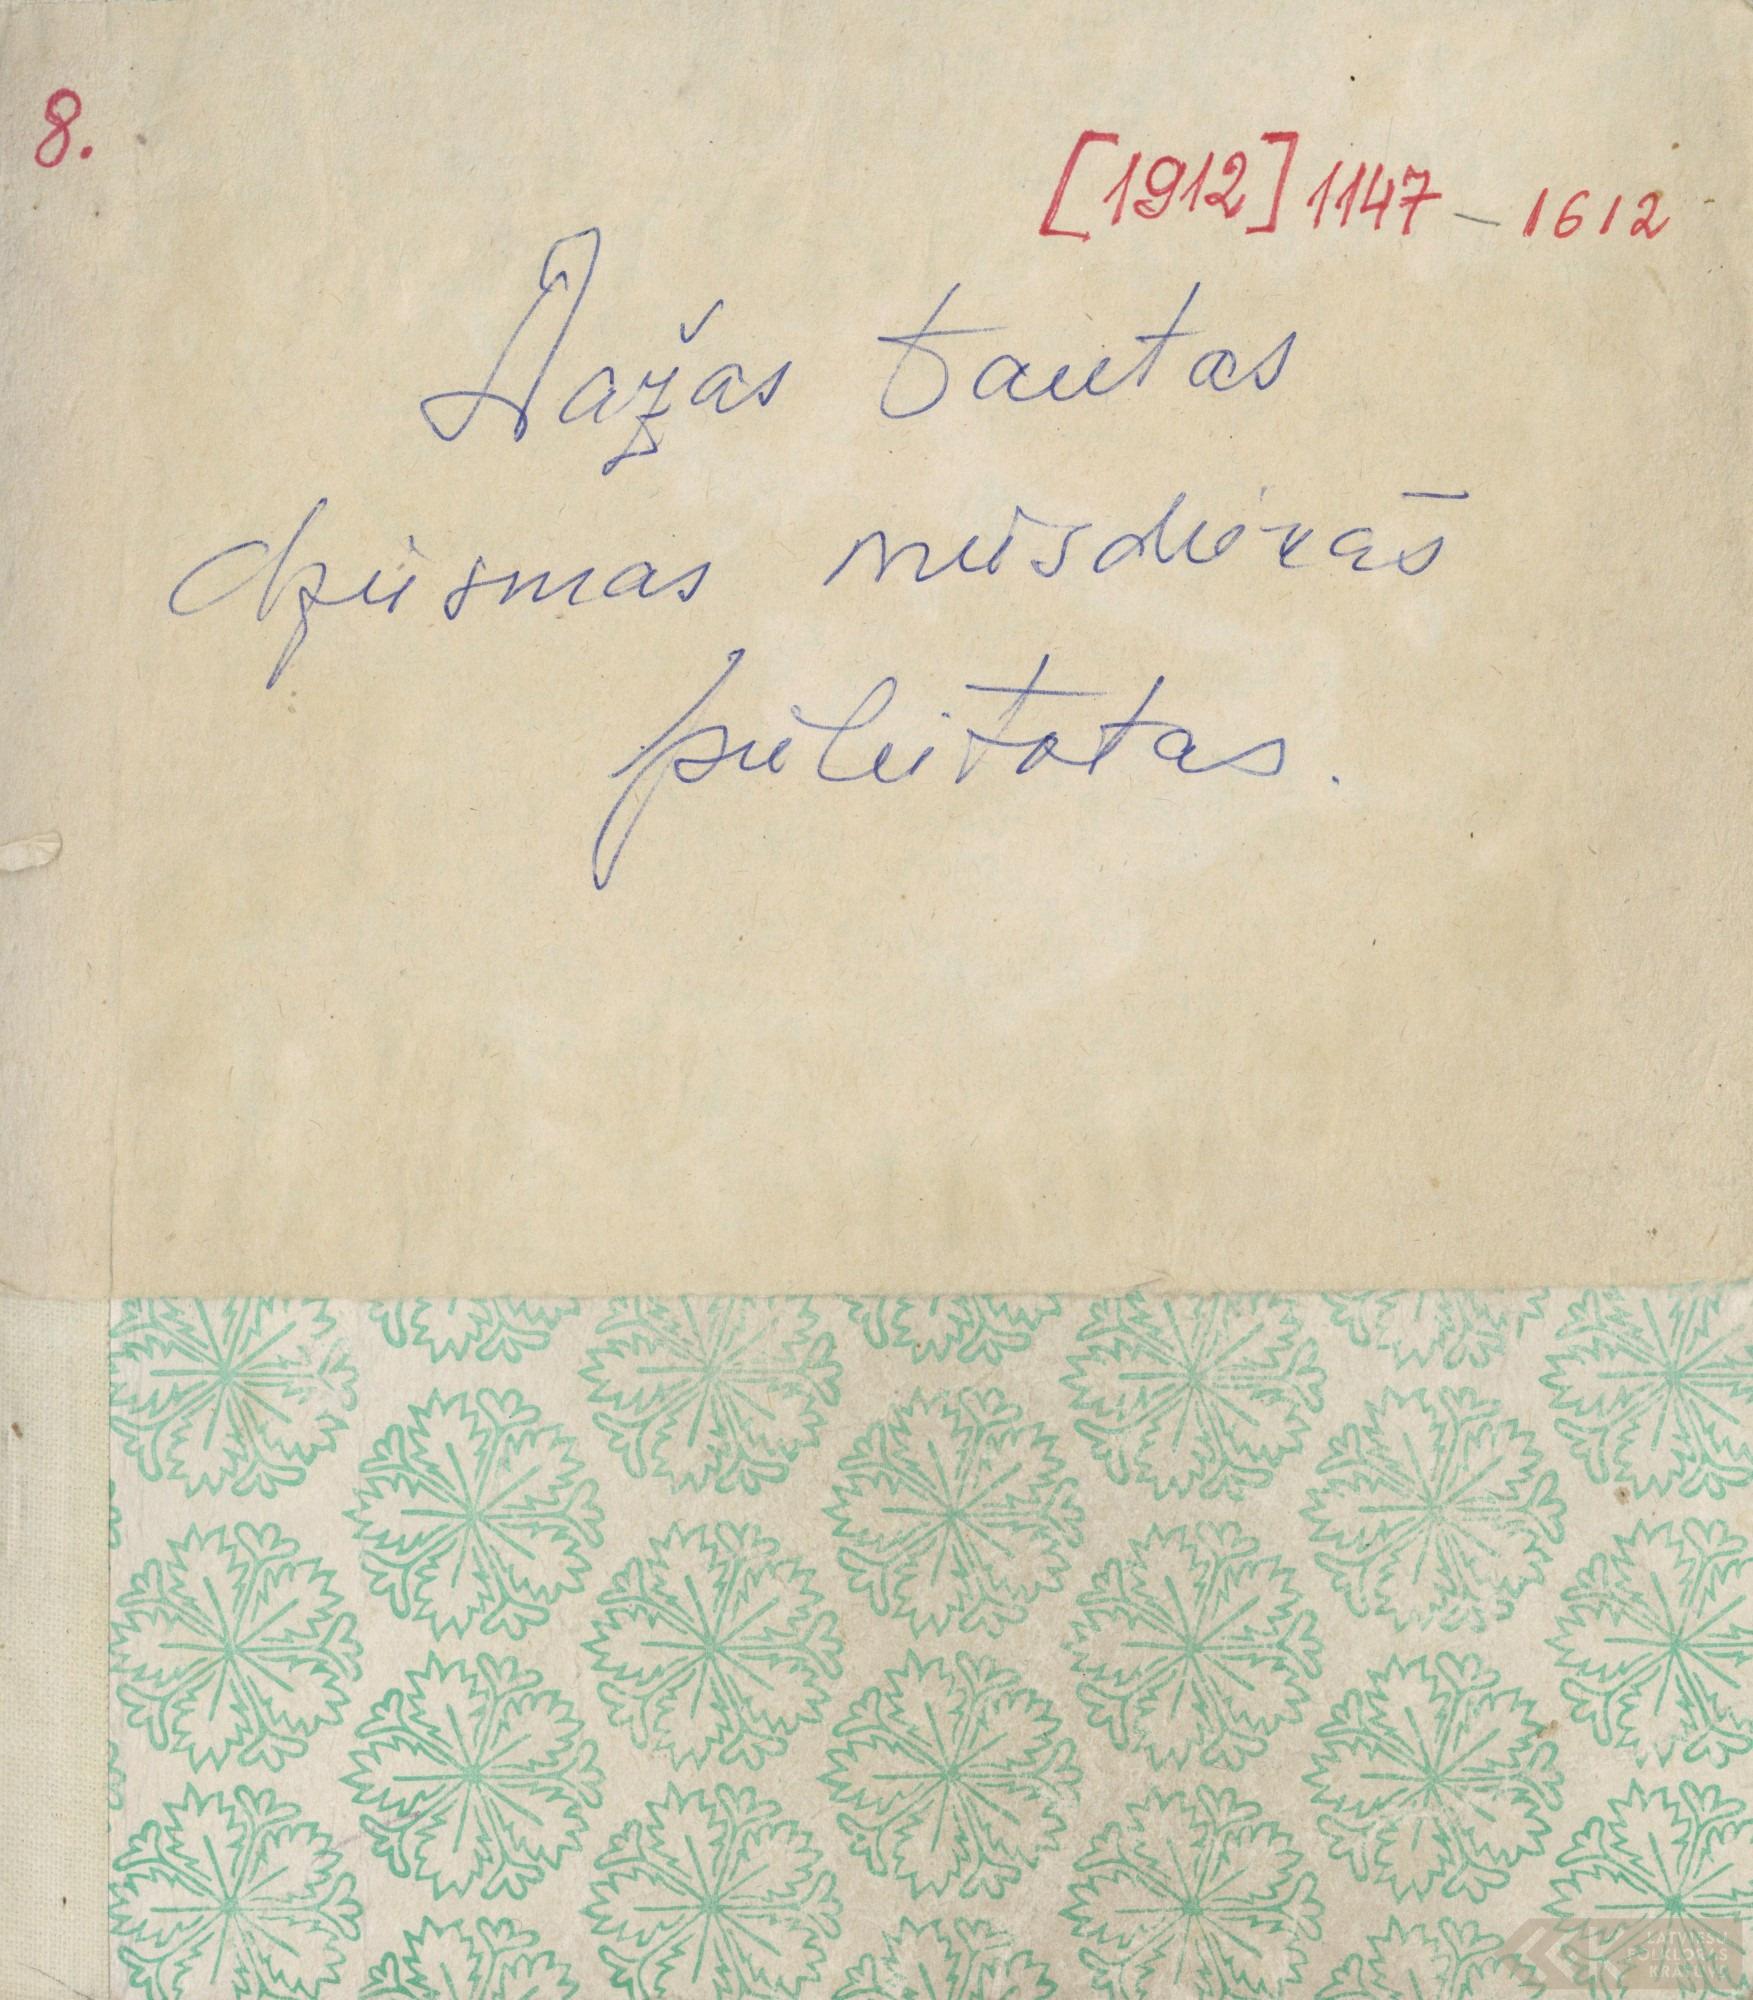 1912-J-un-A-Robeznieki-08-0001